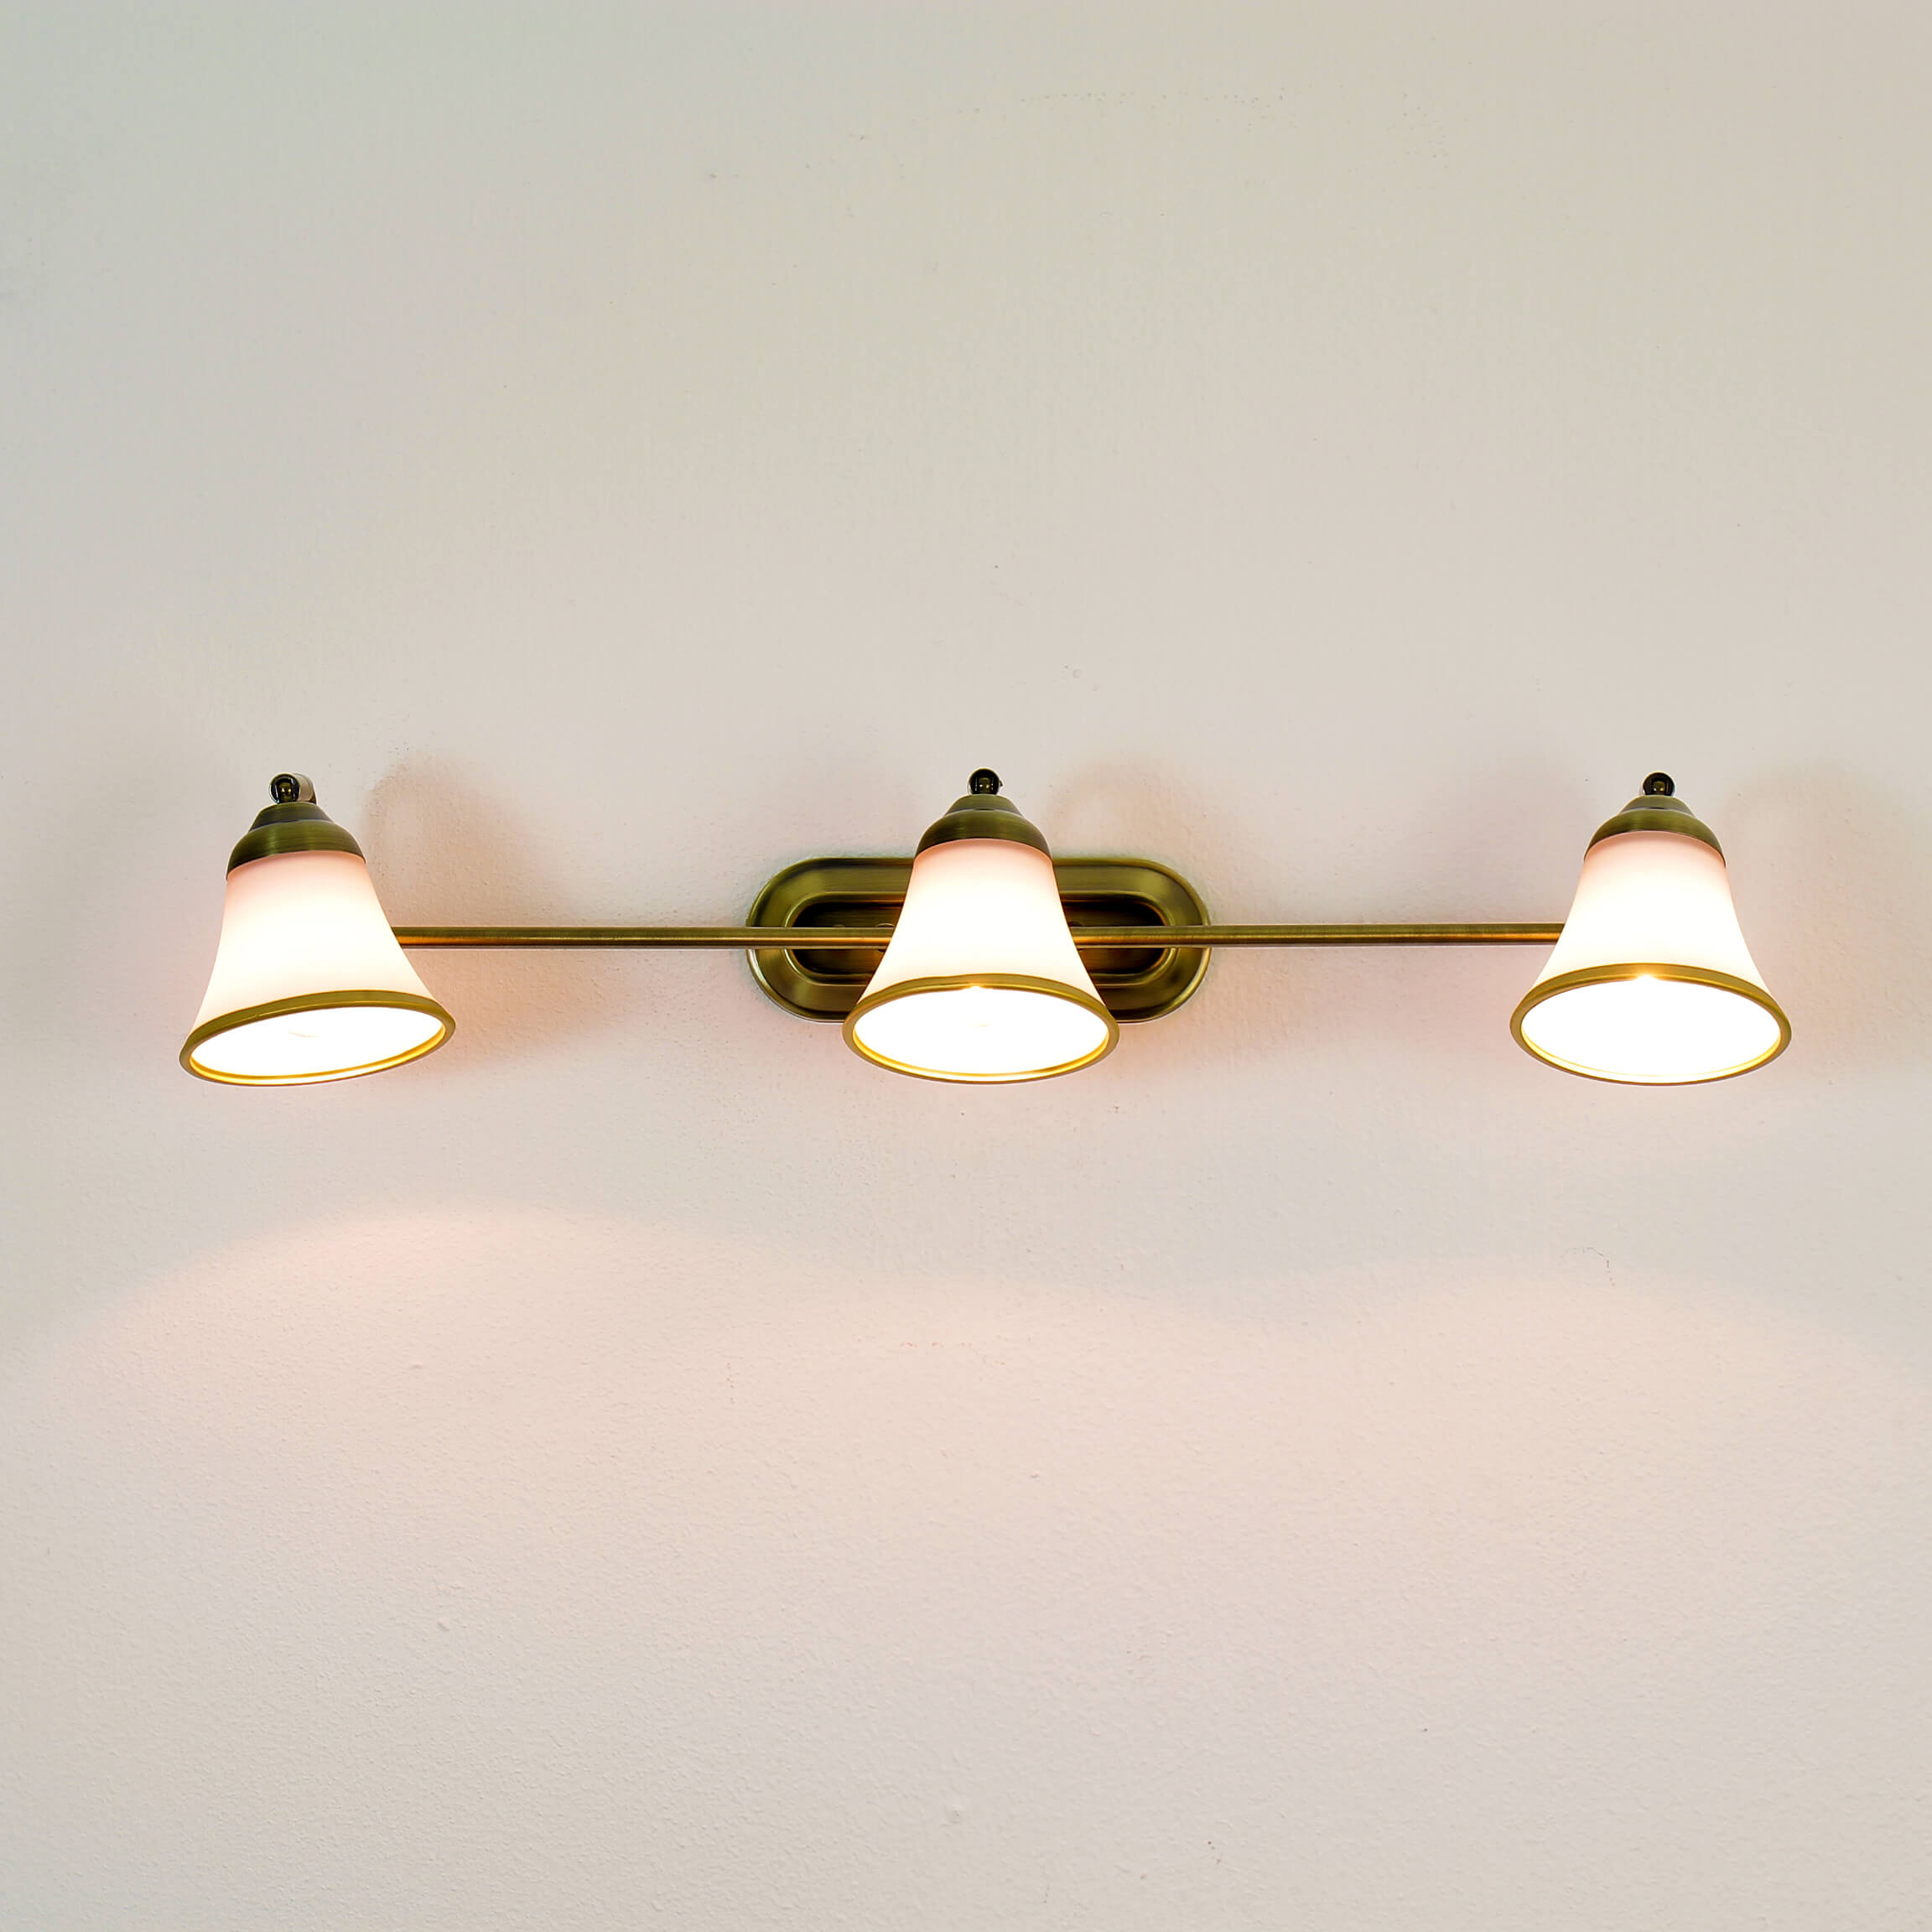 Bad Wandlampe 3xE14 67cm drehbar Jugendstil GRANDO